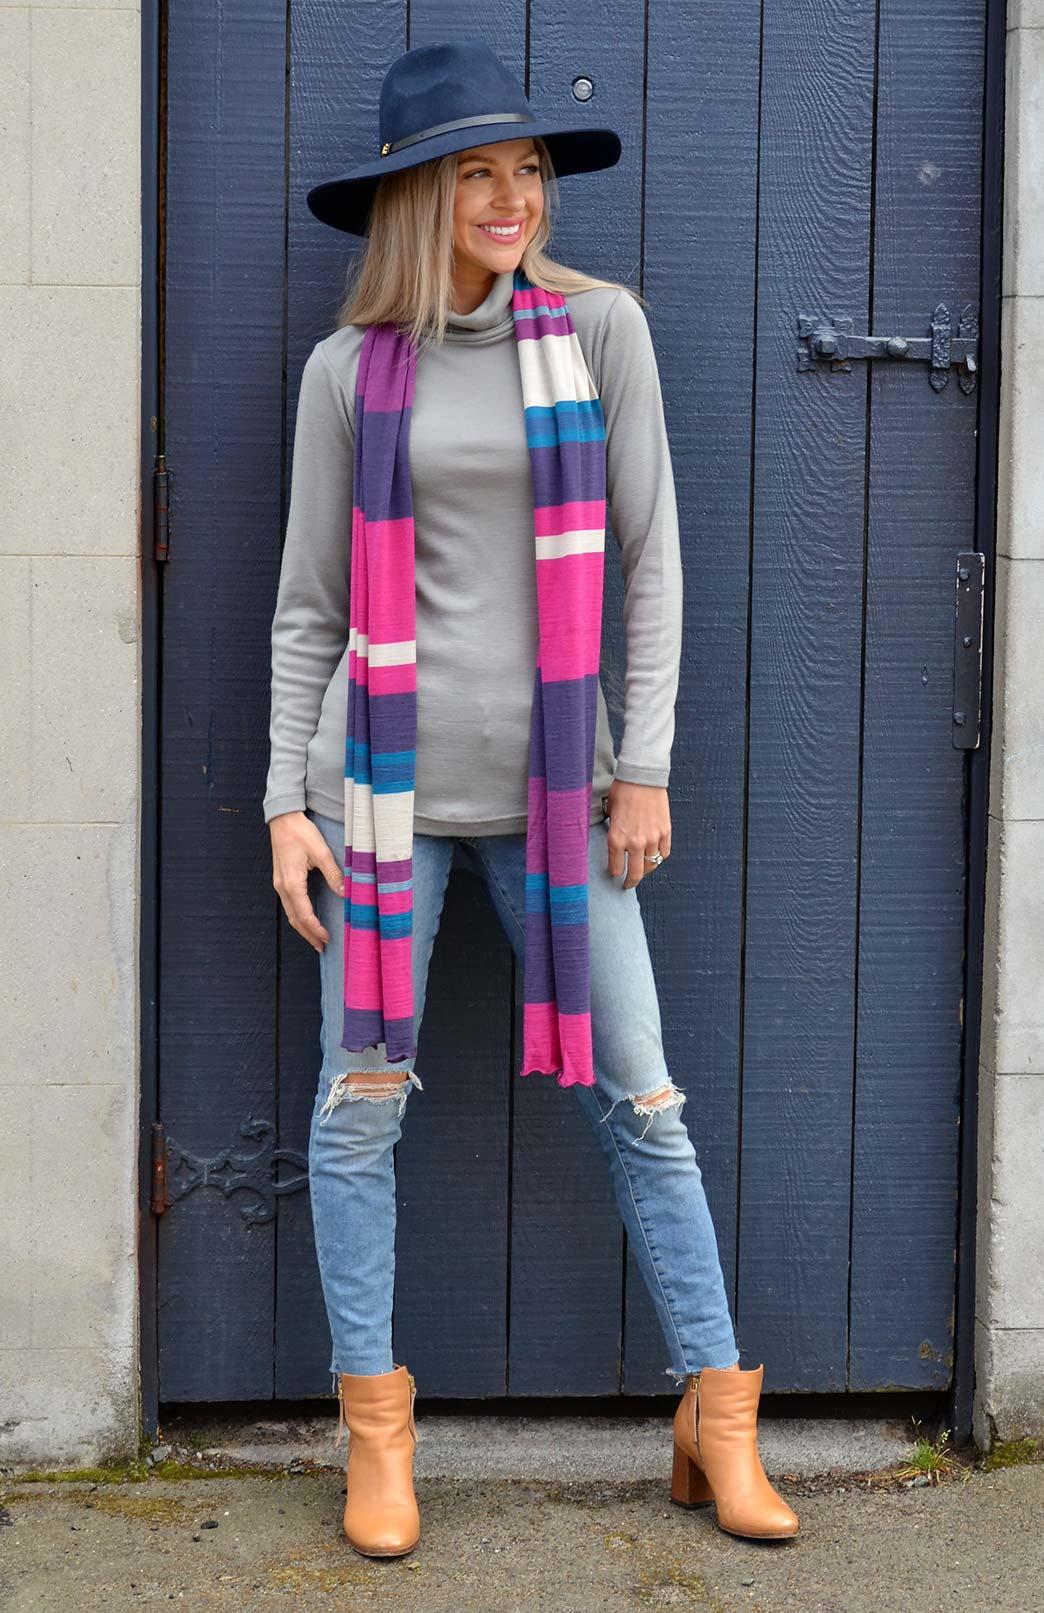 Polo Neck Top - Women's Frost coloured Wool Long Sleeved Polo Neck Top - Smitten Merino Tasmania Australia